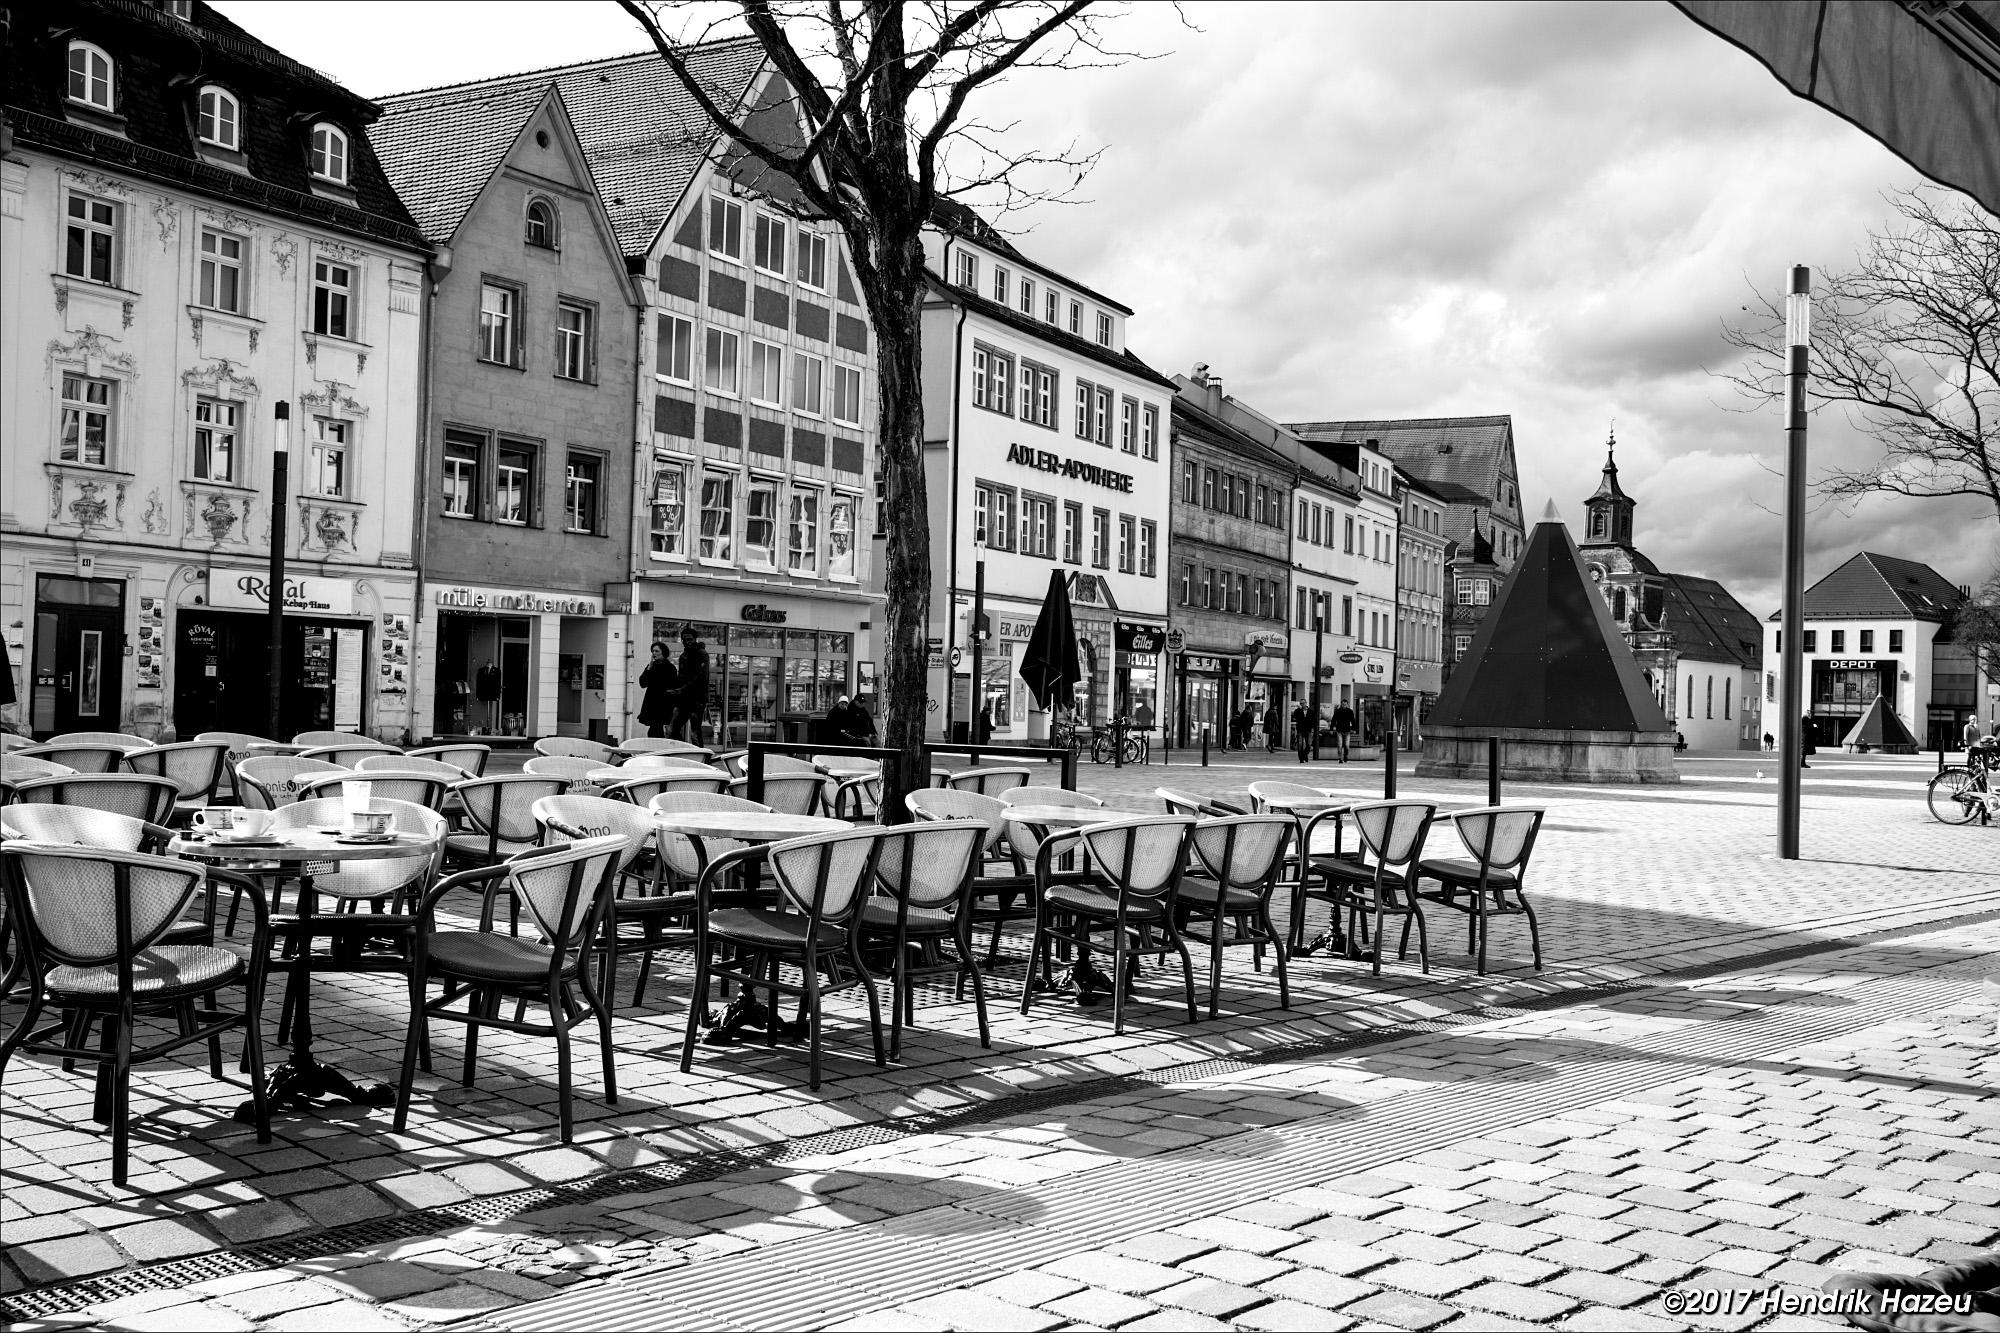 First spring sun in Bayreuth, Fuji X-Pro2 with XF 23 mm / f2, SOOC ACROS JPEG